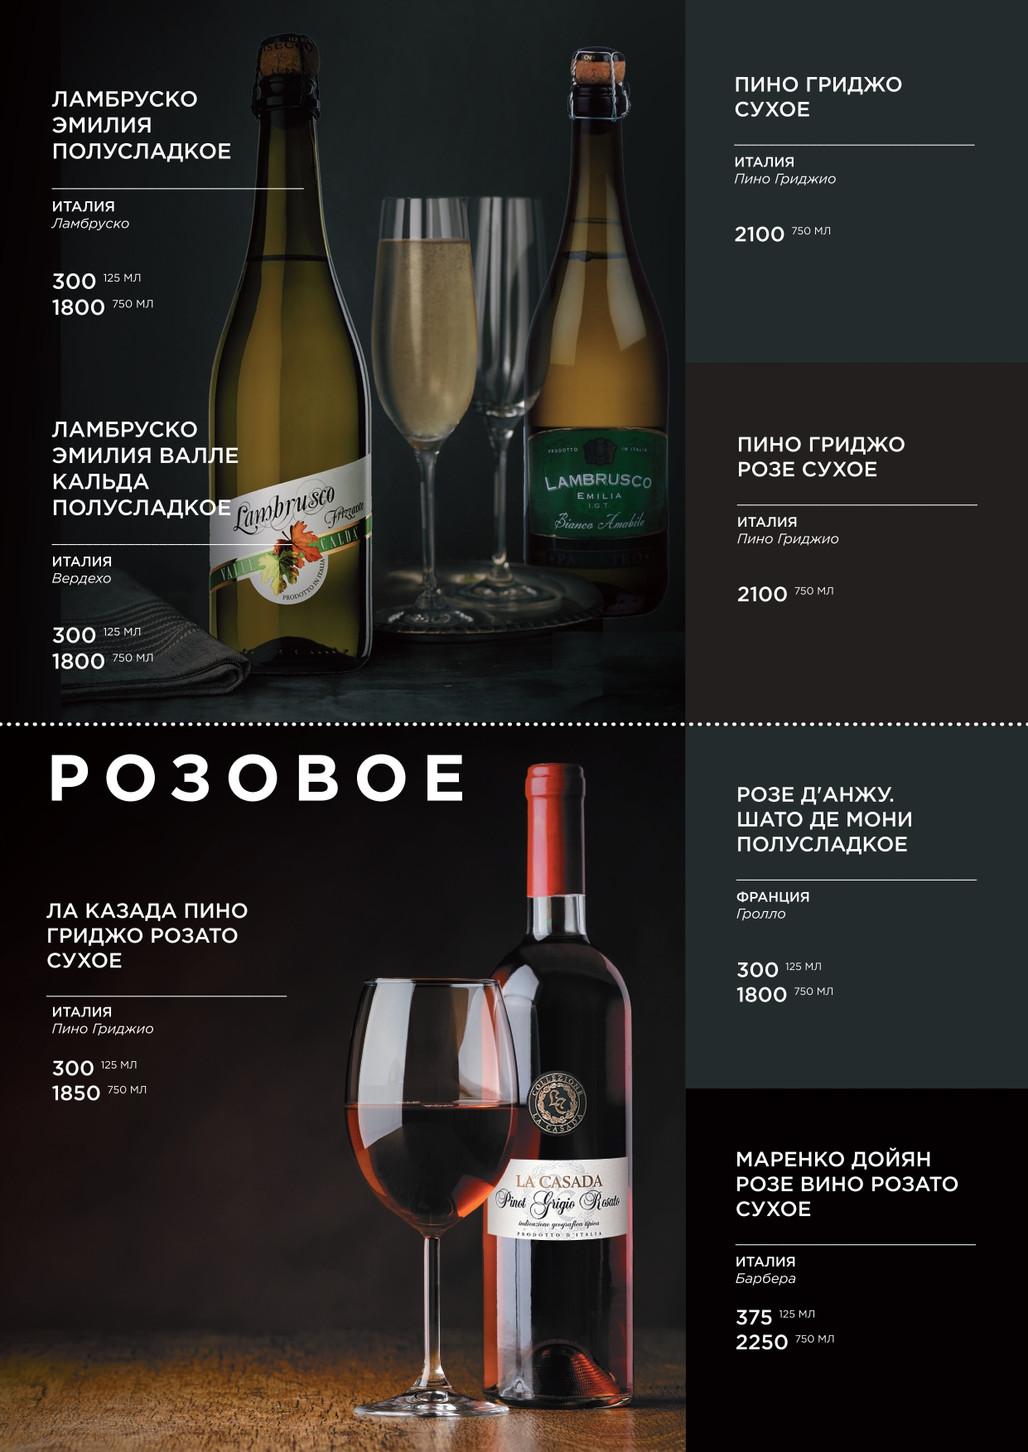 gastroli_wine_menu_print_page-0007.jpg